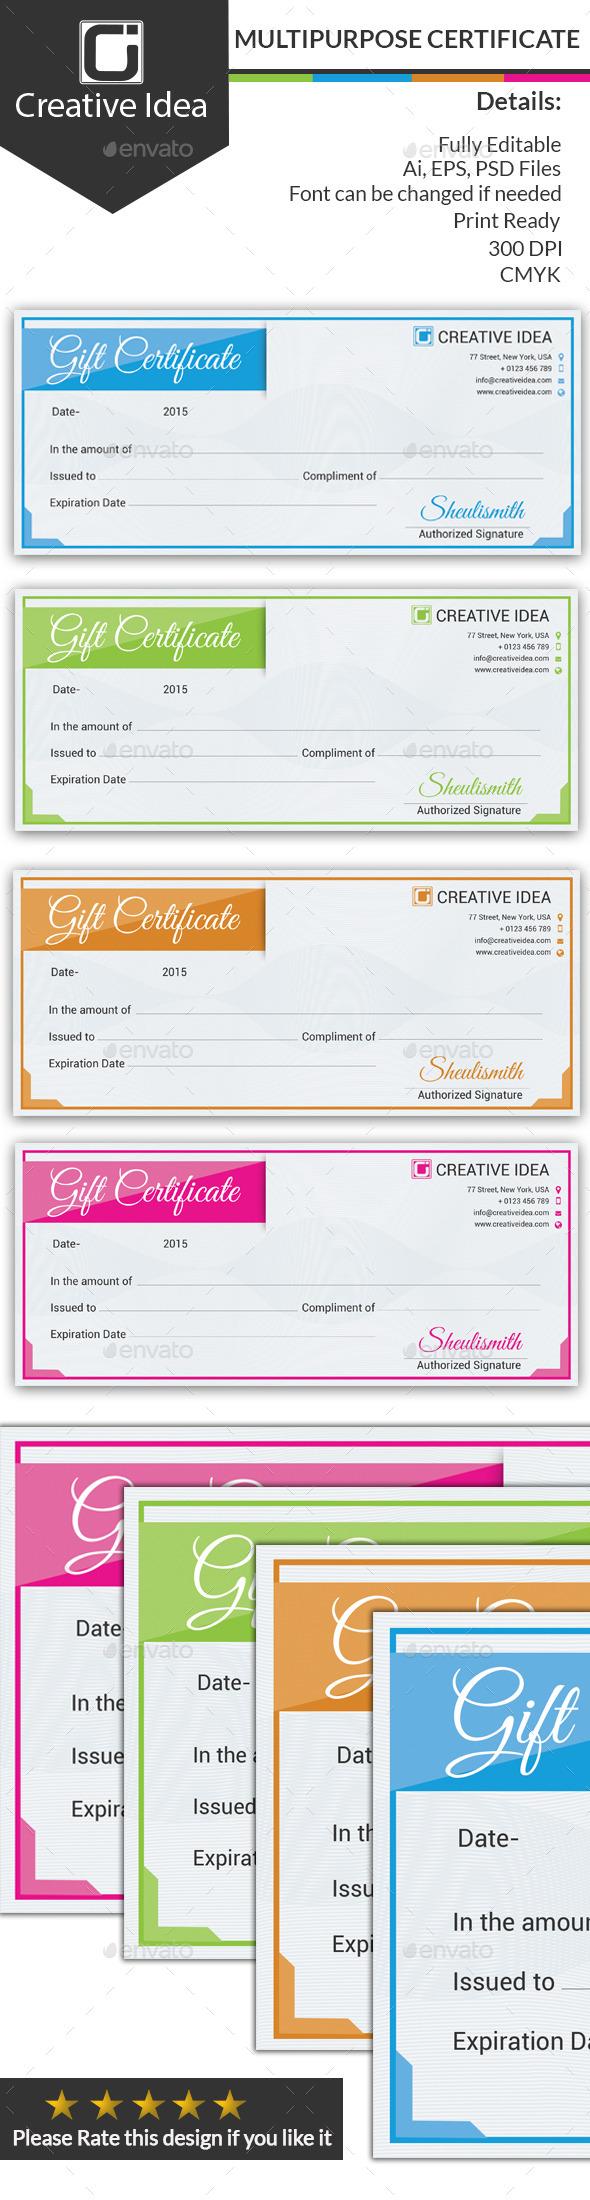 GraphicRiver Multipurpose Certificate 10285020